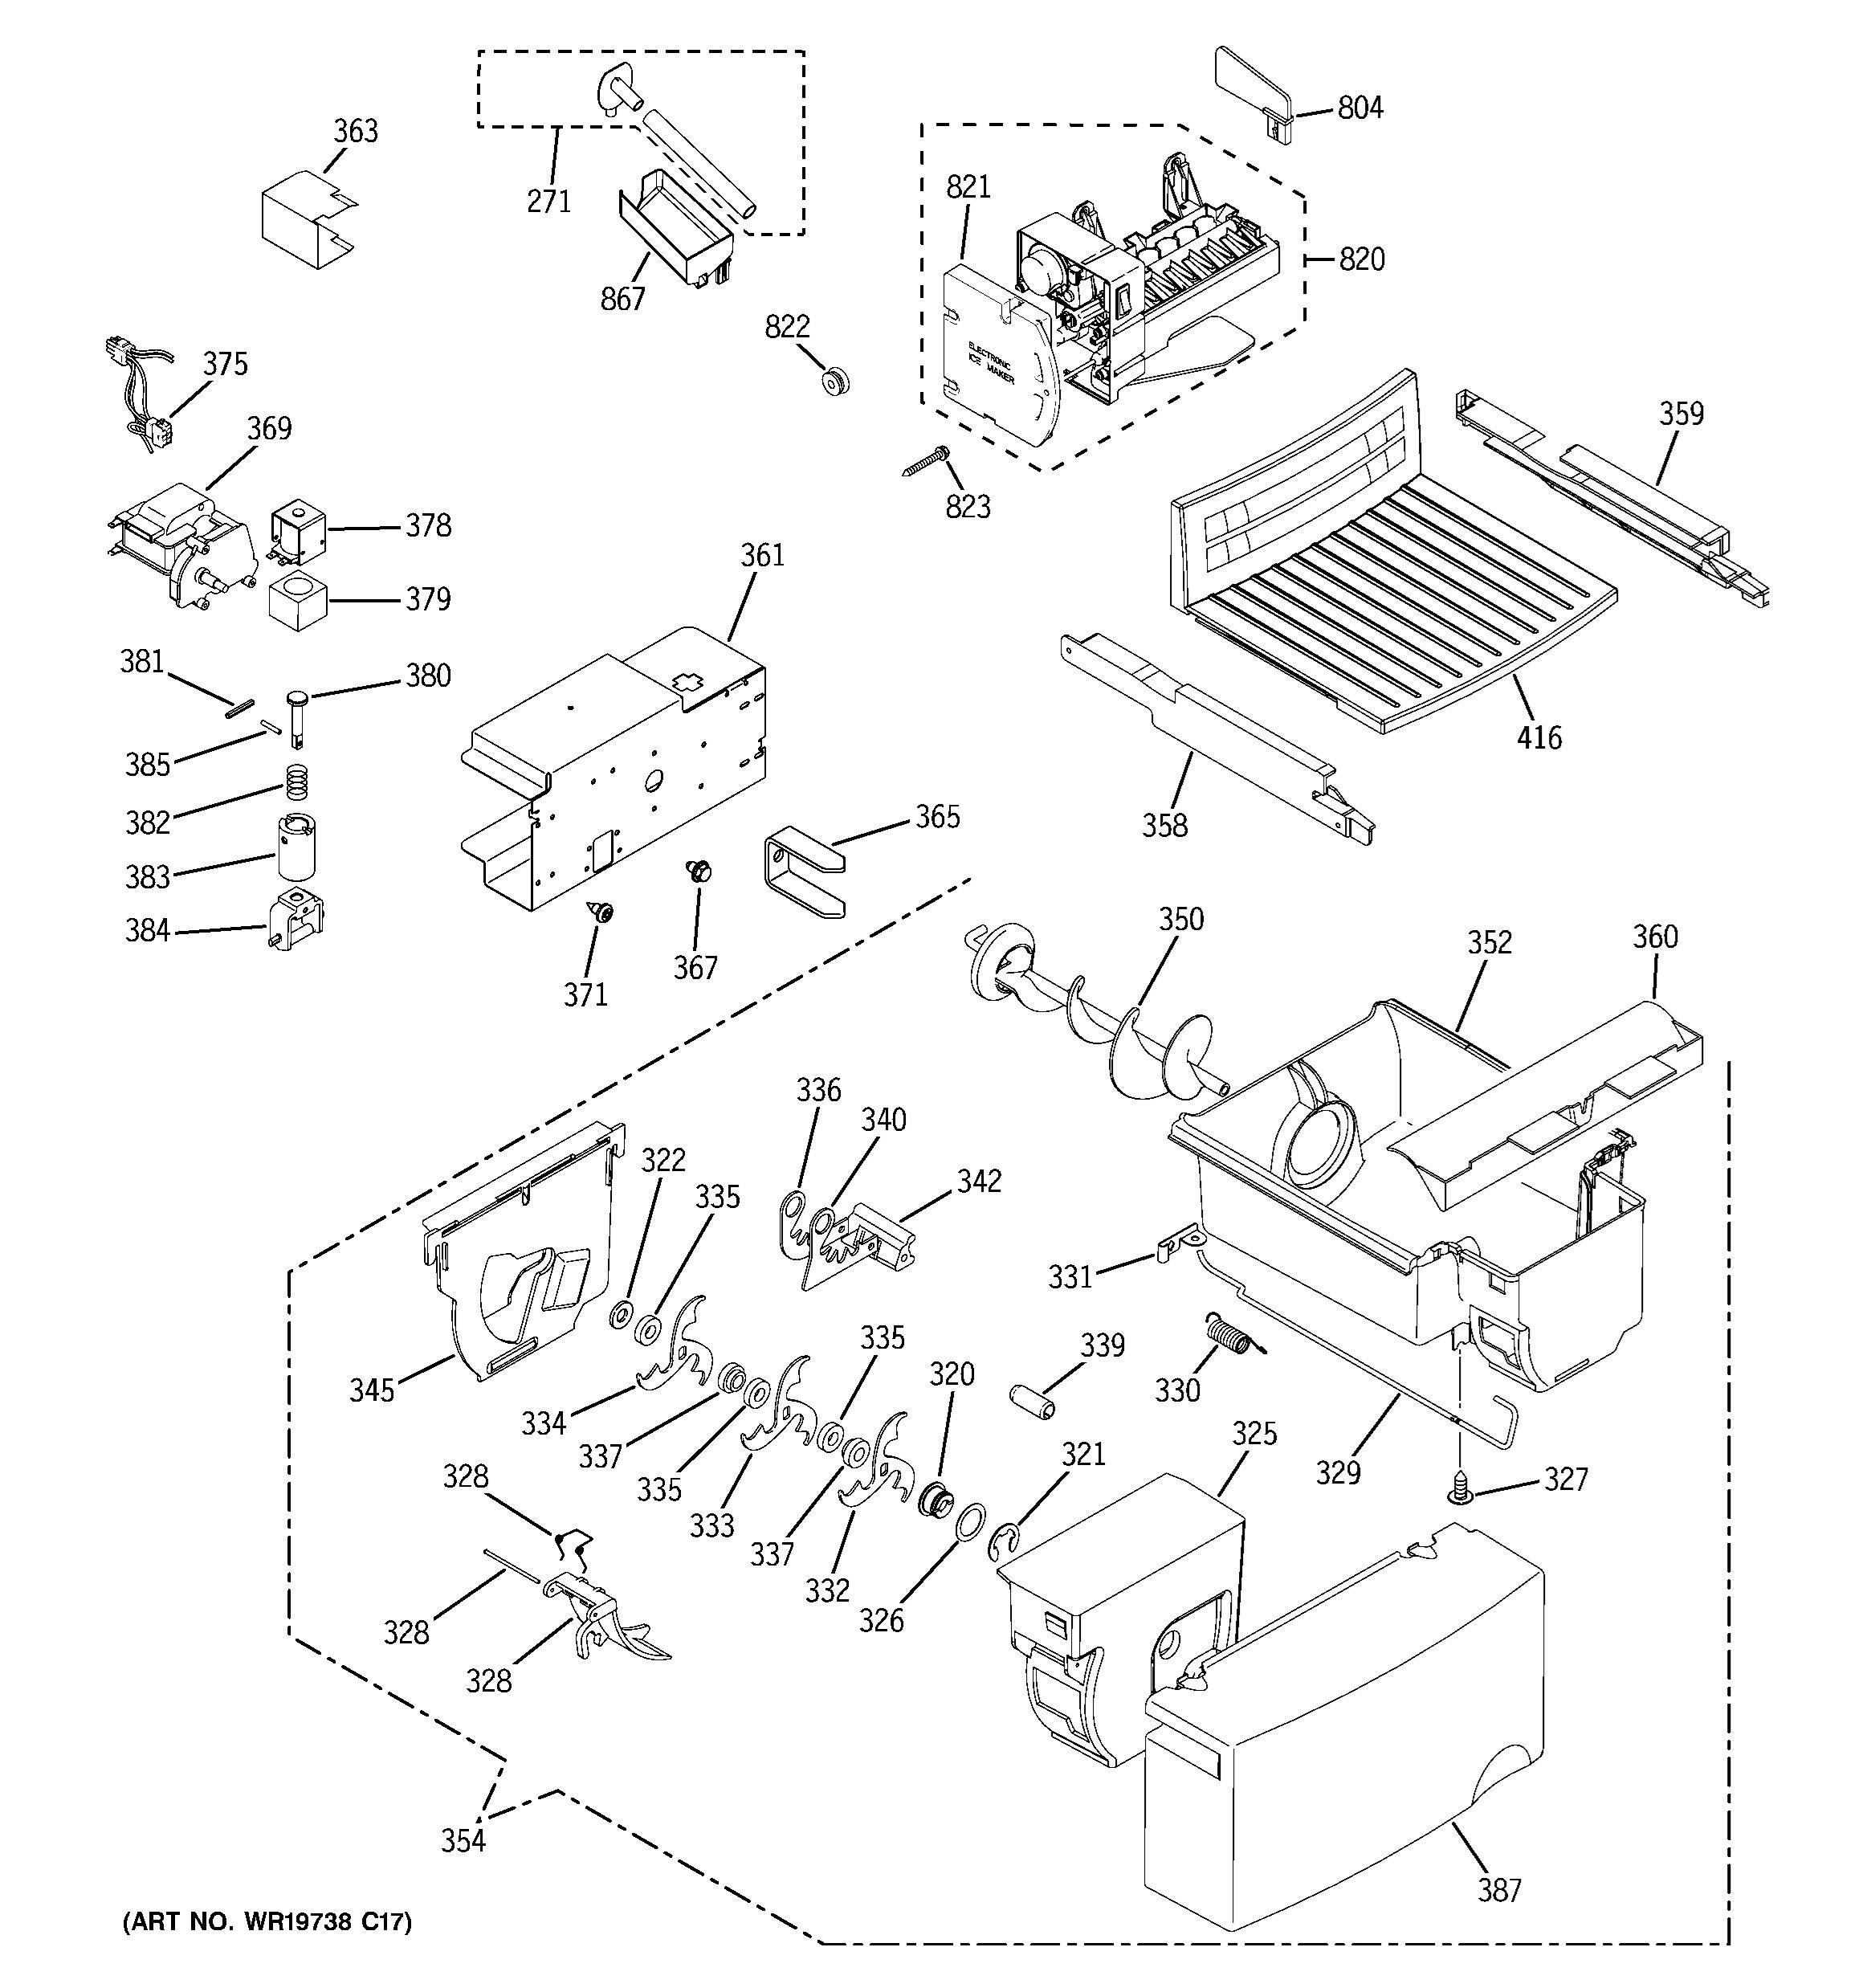 GeneralElectricImg_00136600_00136658.i05 motor leeson diagram wiring c184t17fb46c auto electrical wiring